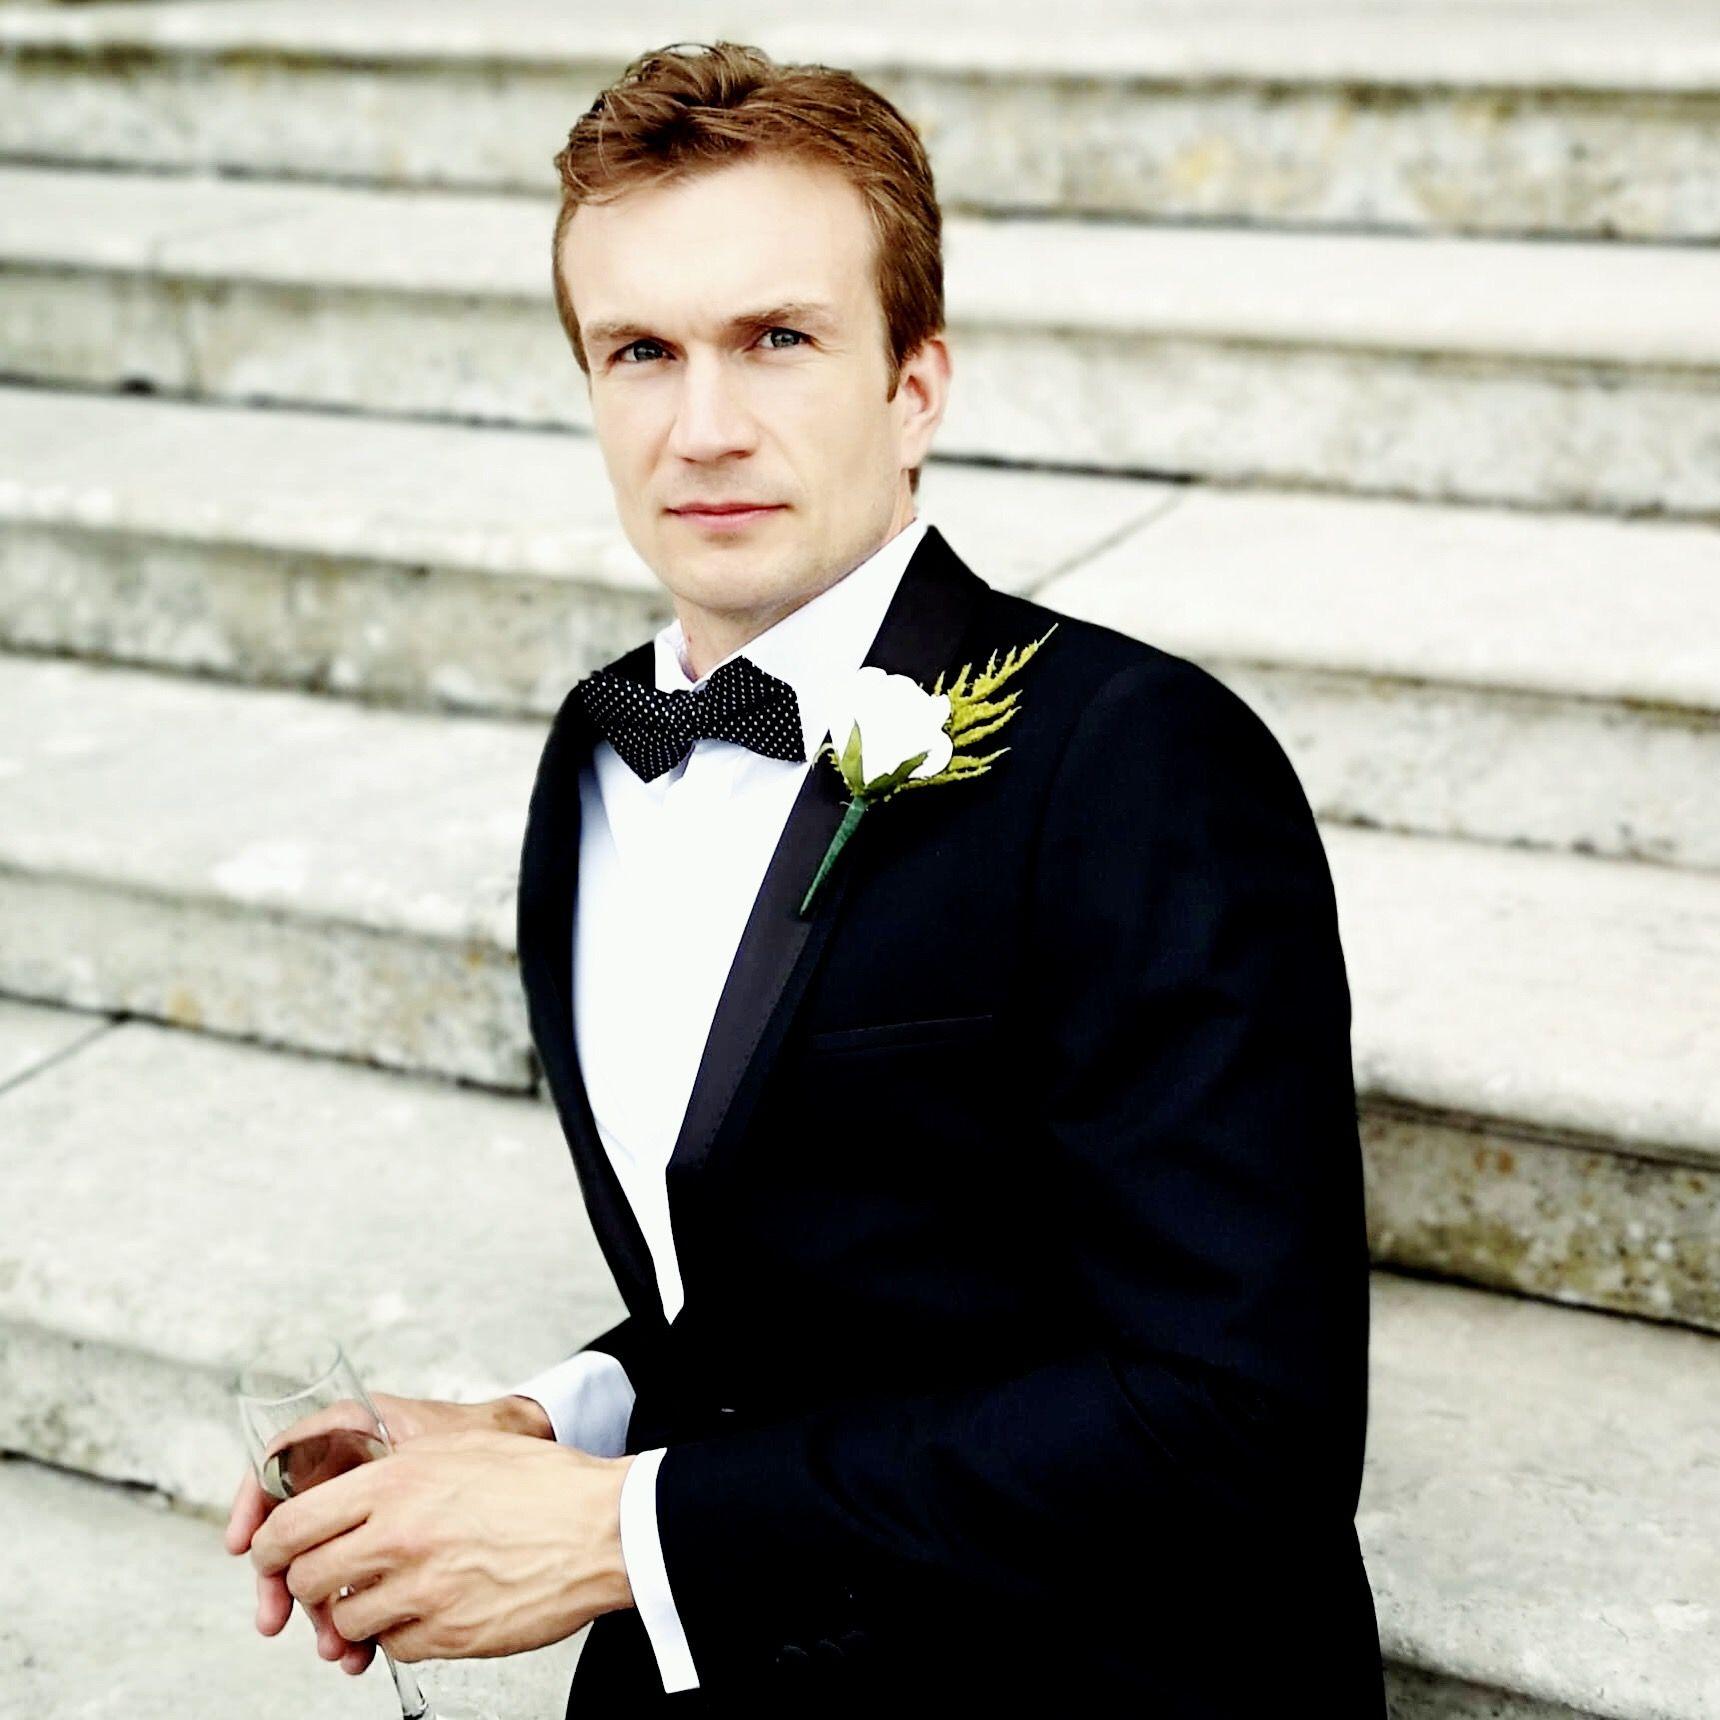 Formal wedding attire ideas Wedding suit hire, Formal